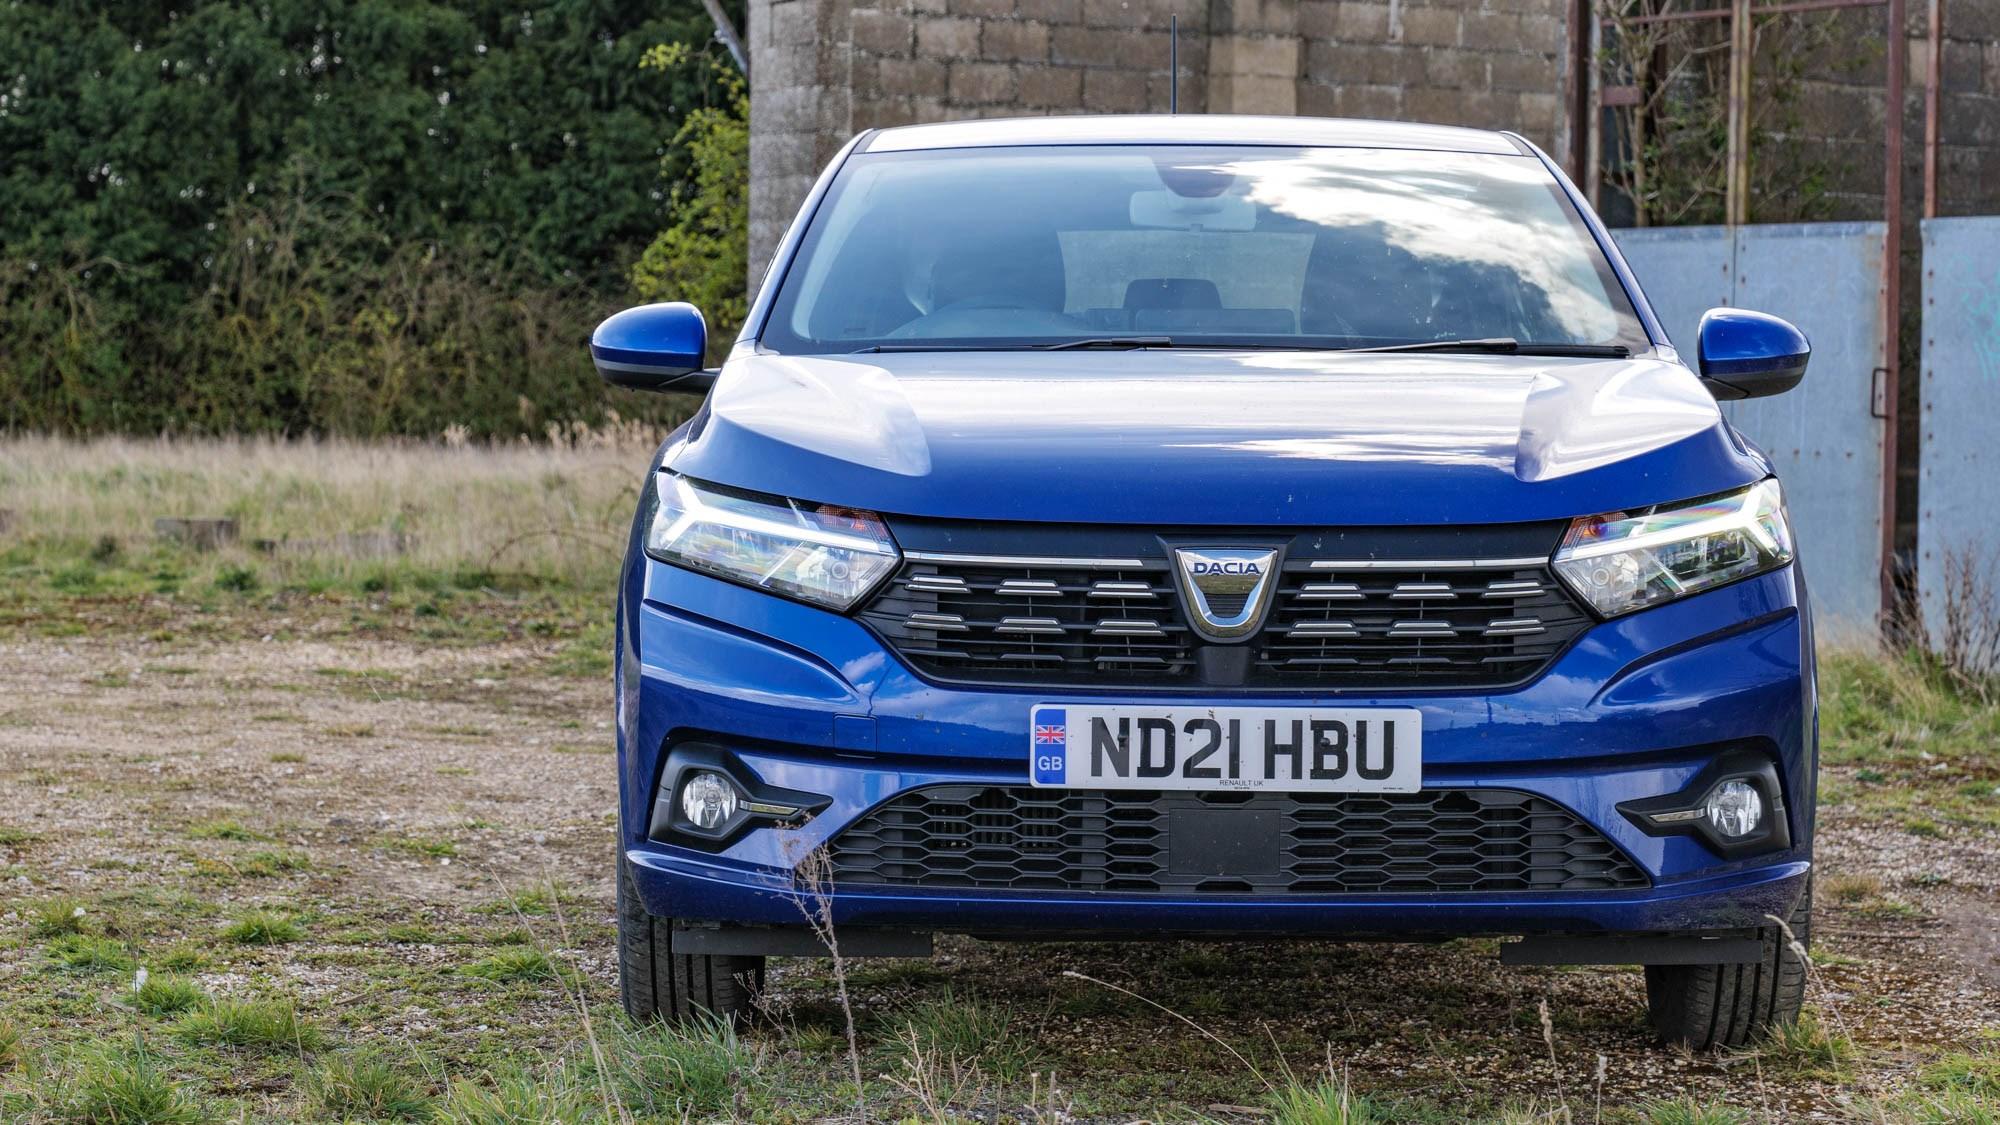 2021 Dacia Sandero Comfort front view, blue